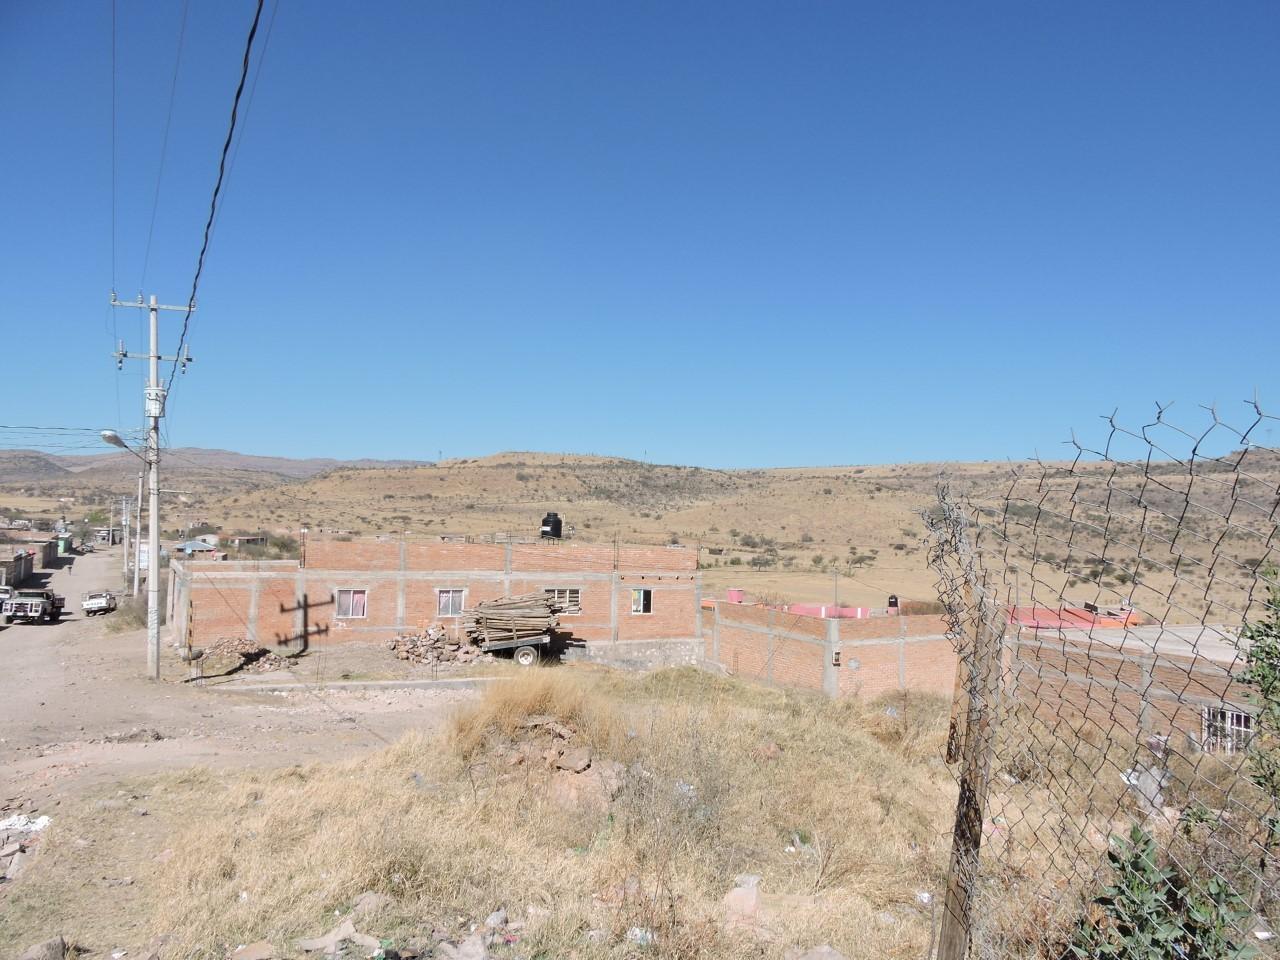 Asentamientos irregulares, problema añejo